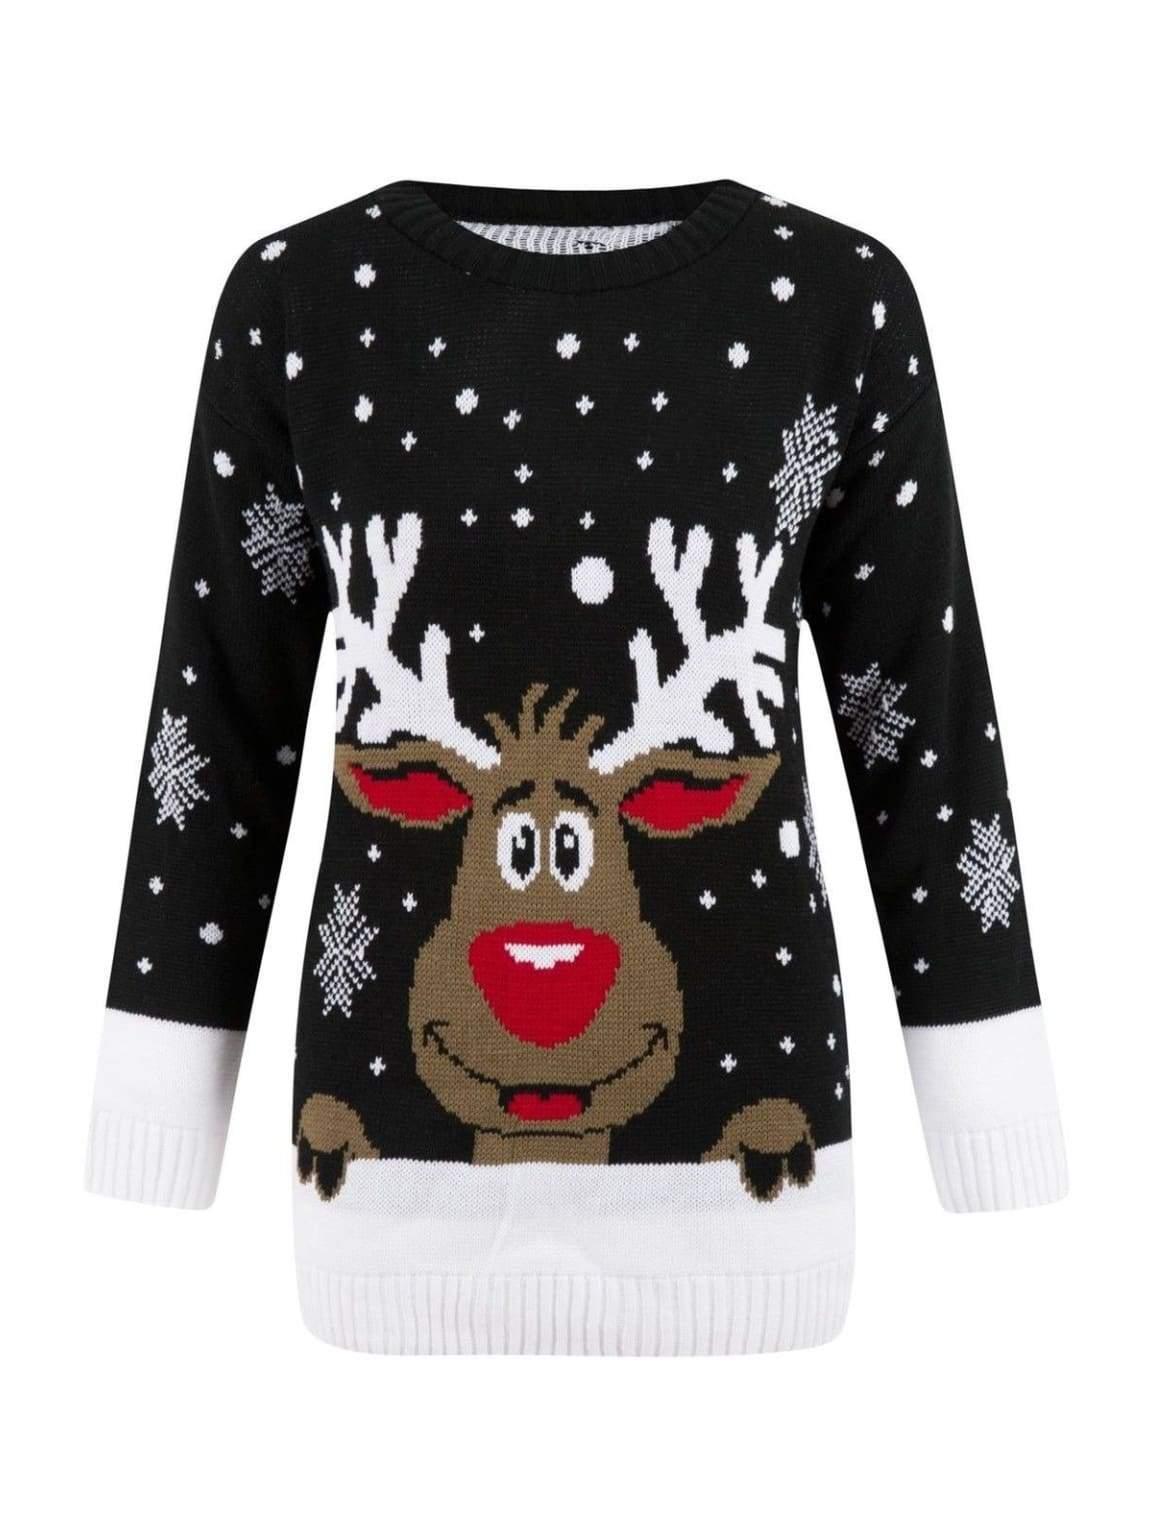 Christmas Rudolph Reindeer Snow Flake Jumper In Black - S/M - Shirts